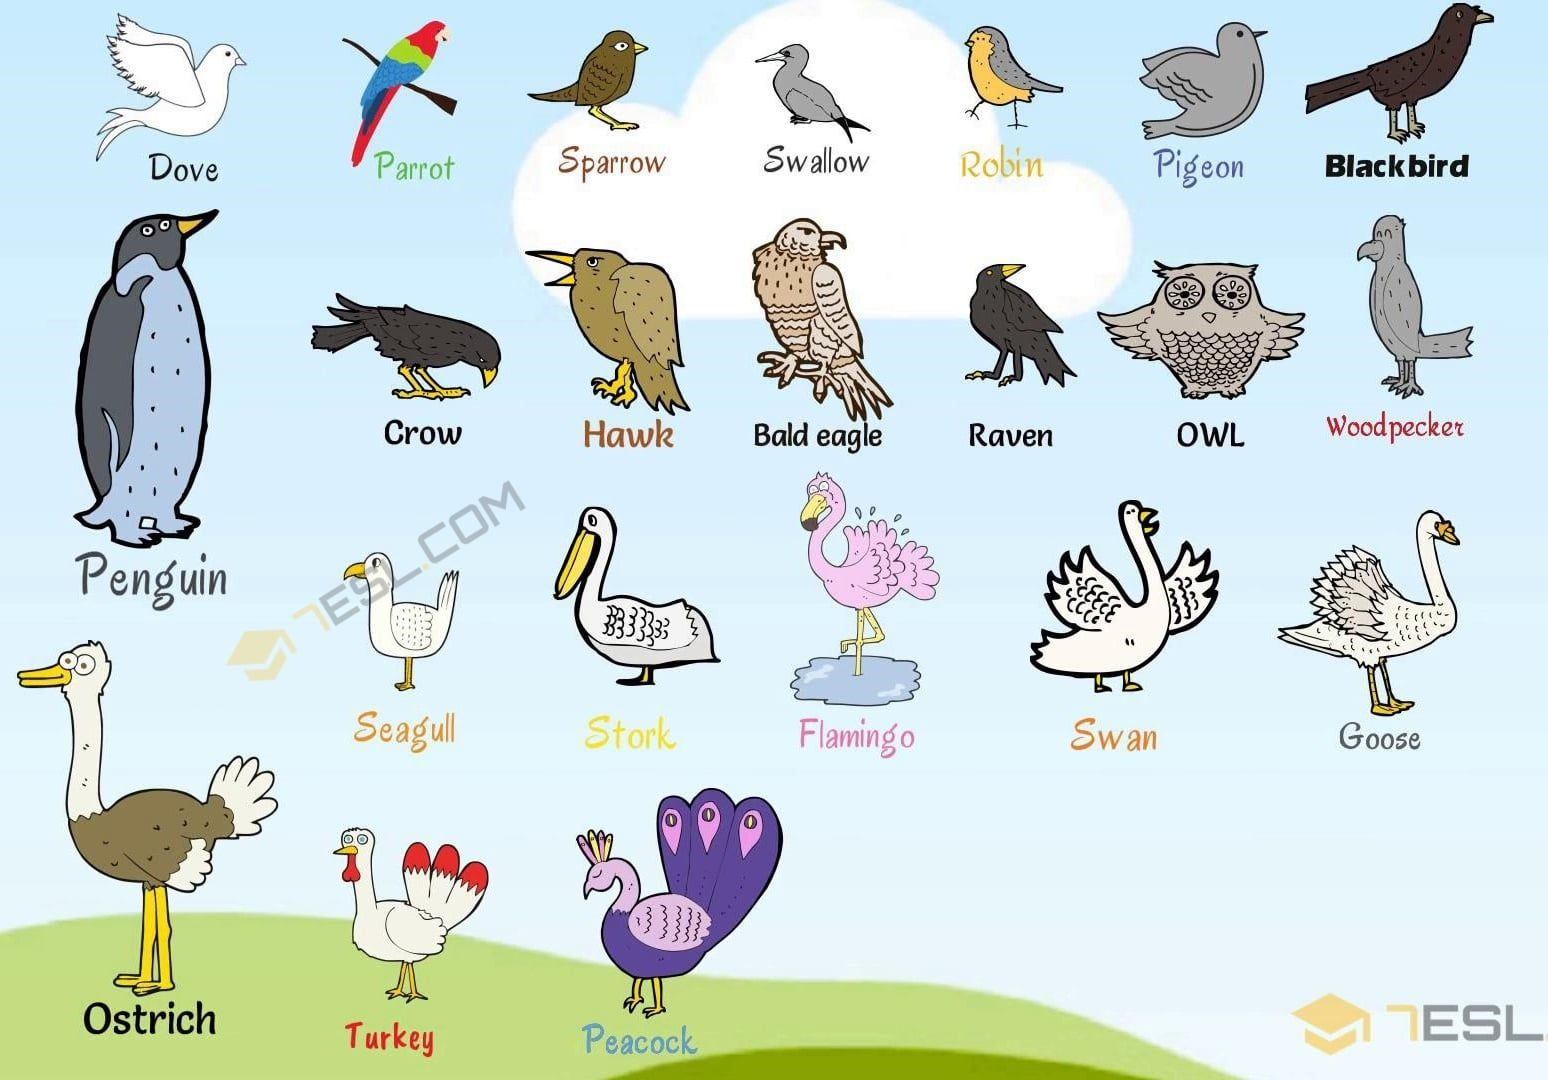 Bird Names List Of Birds With Useful Birds Images